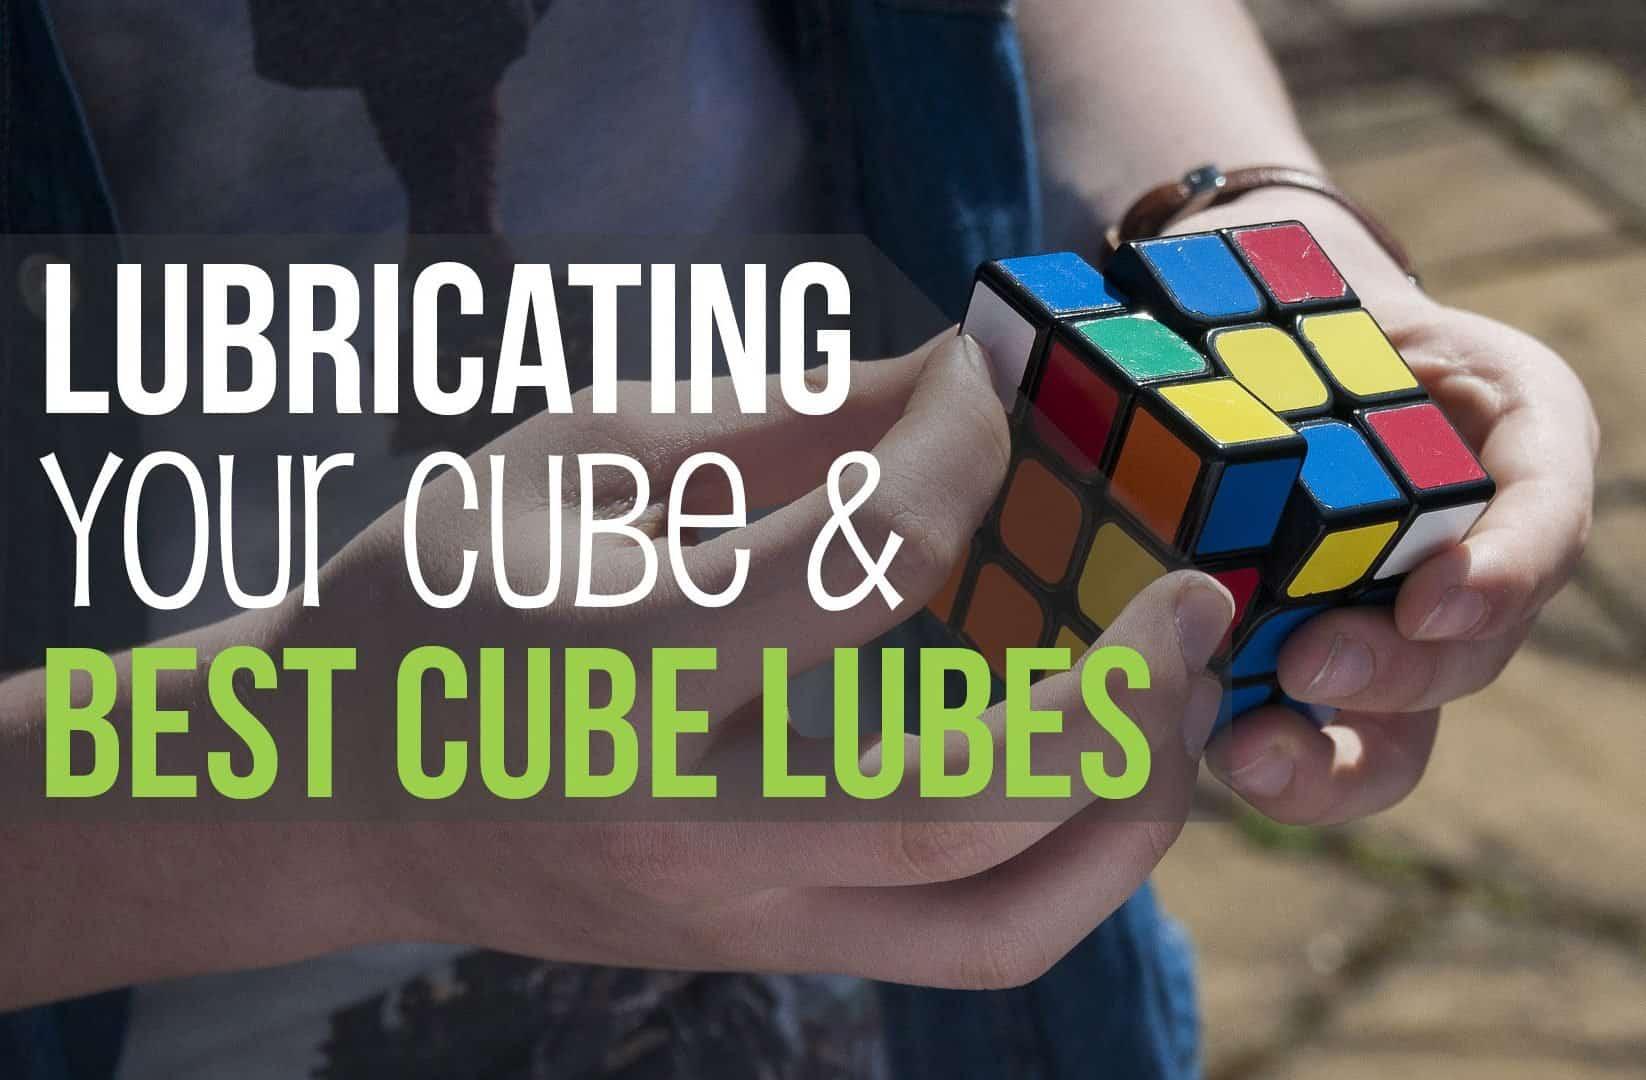 Lubricating speedcube